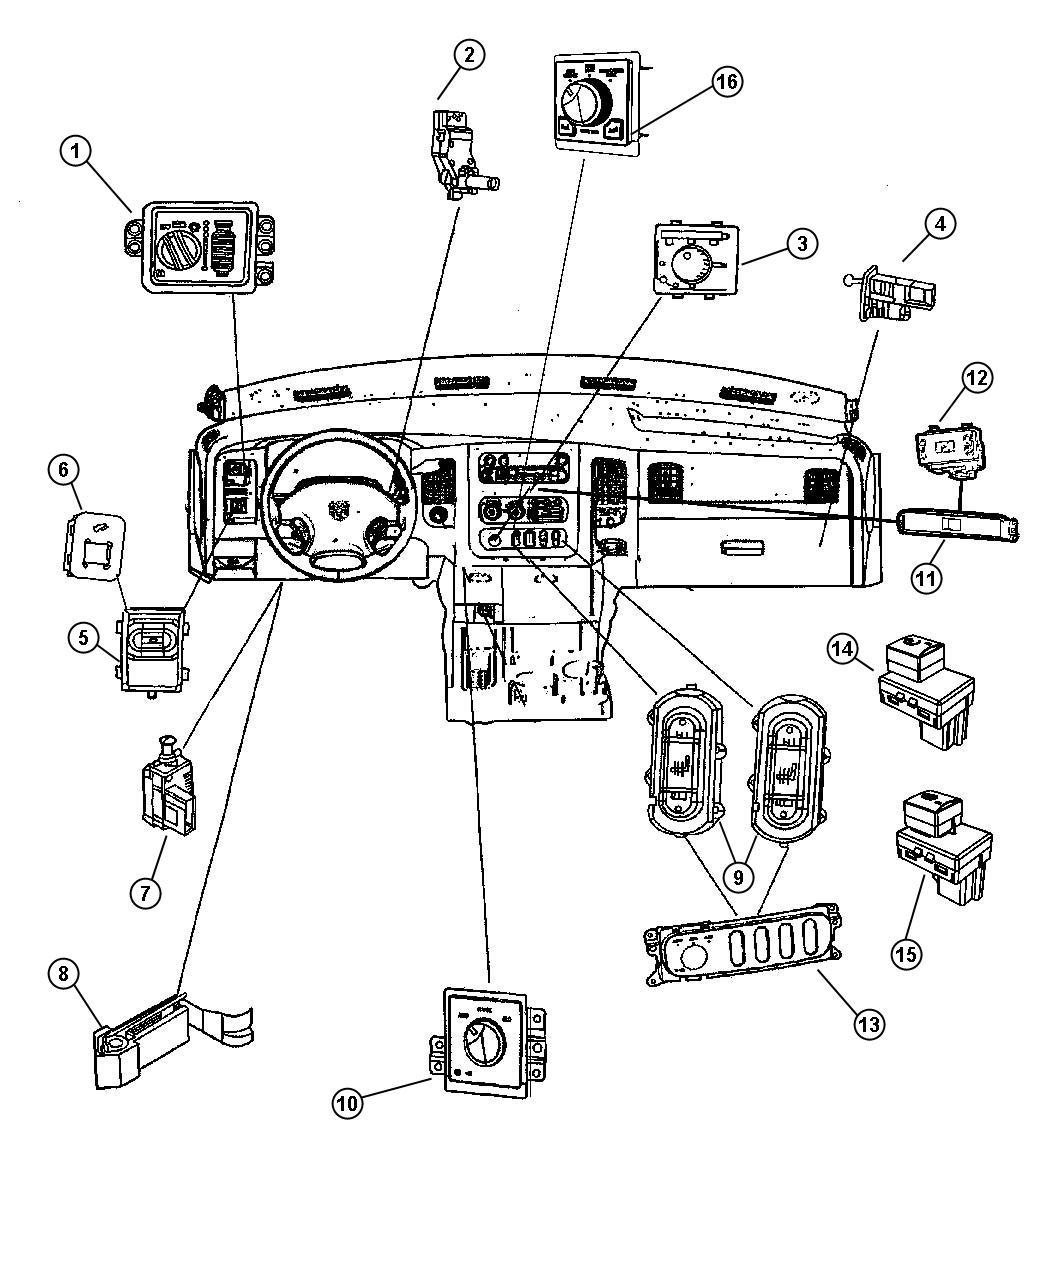 Dodge Ram 2500 Switch. Ignition. Column, steering, tilt